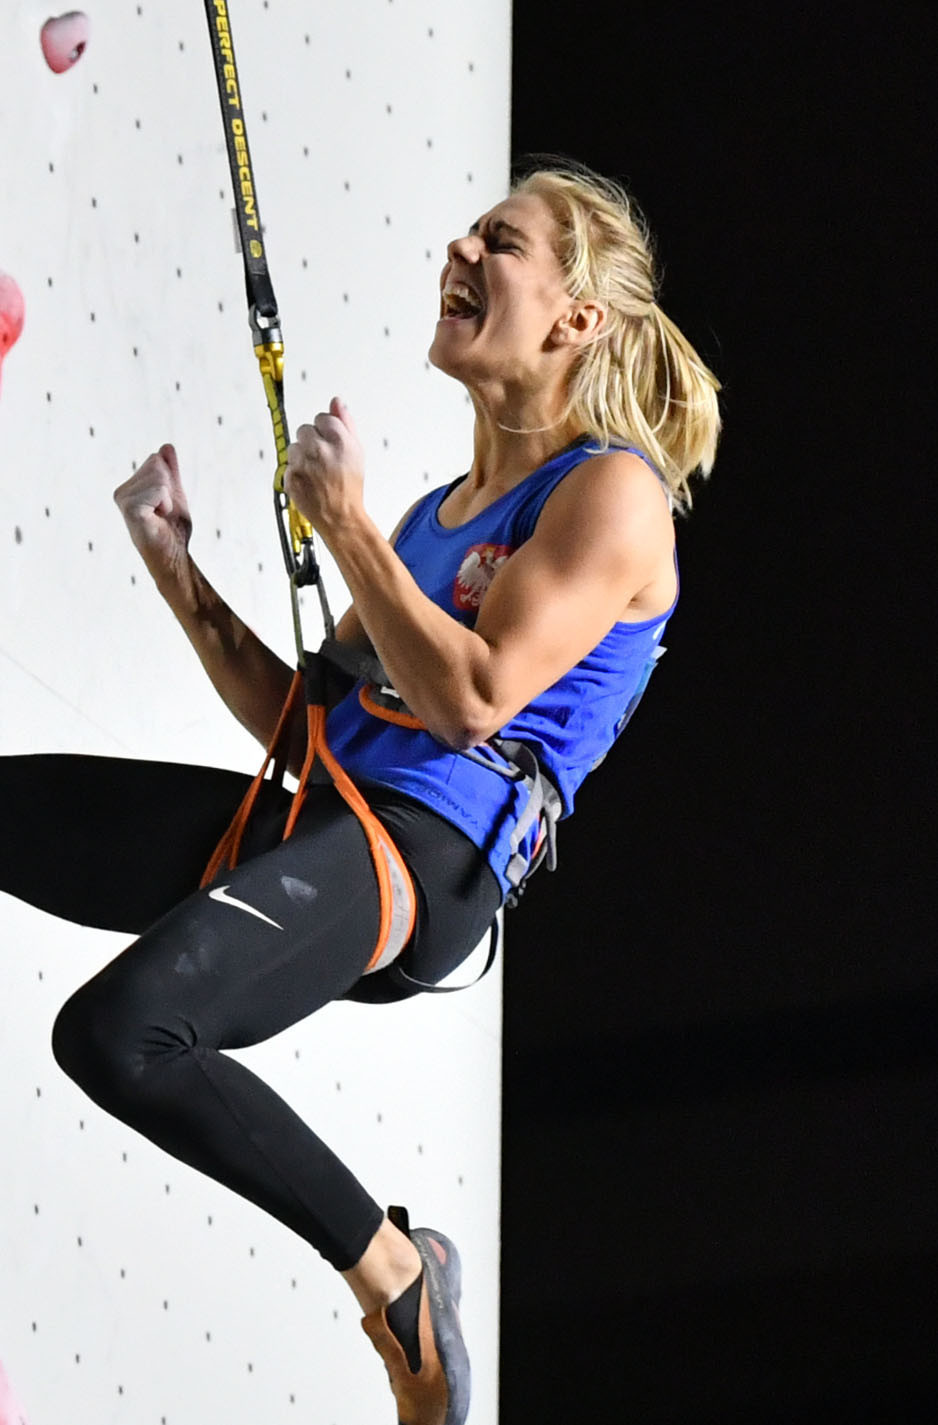 Miroslaw retains speed title at IFSC Climbing World Championships